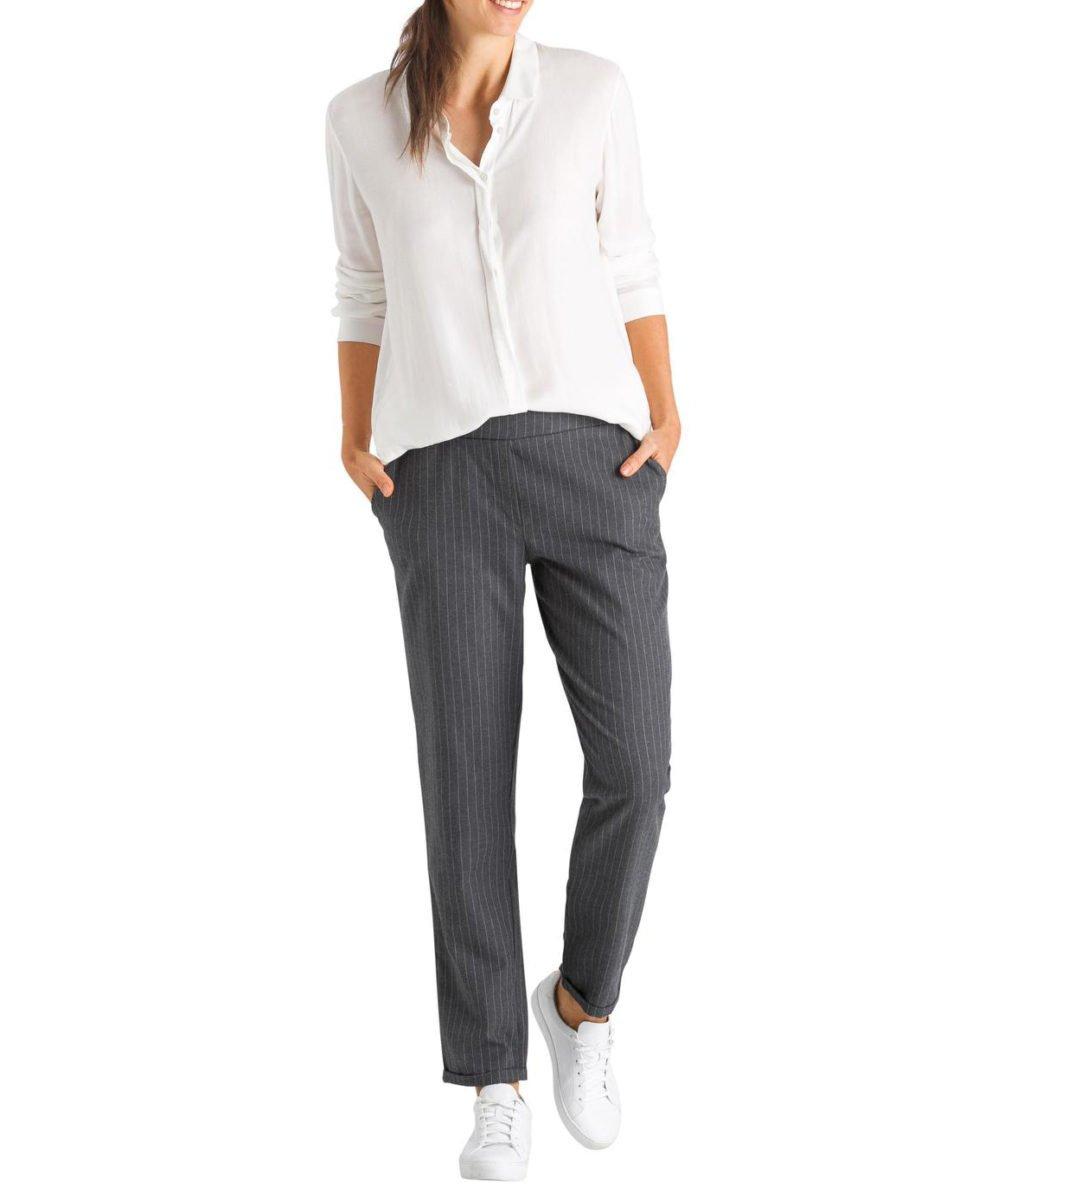 HANRO Urban Casuals Long Sleeve Shirt